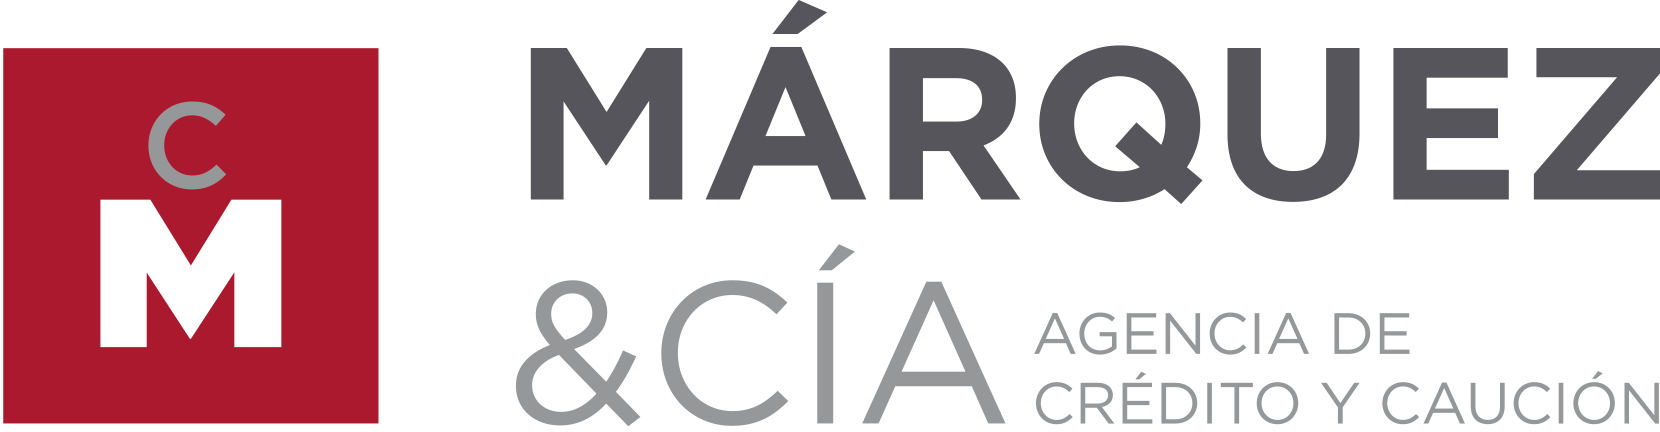 Marquez&CIA